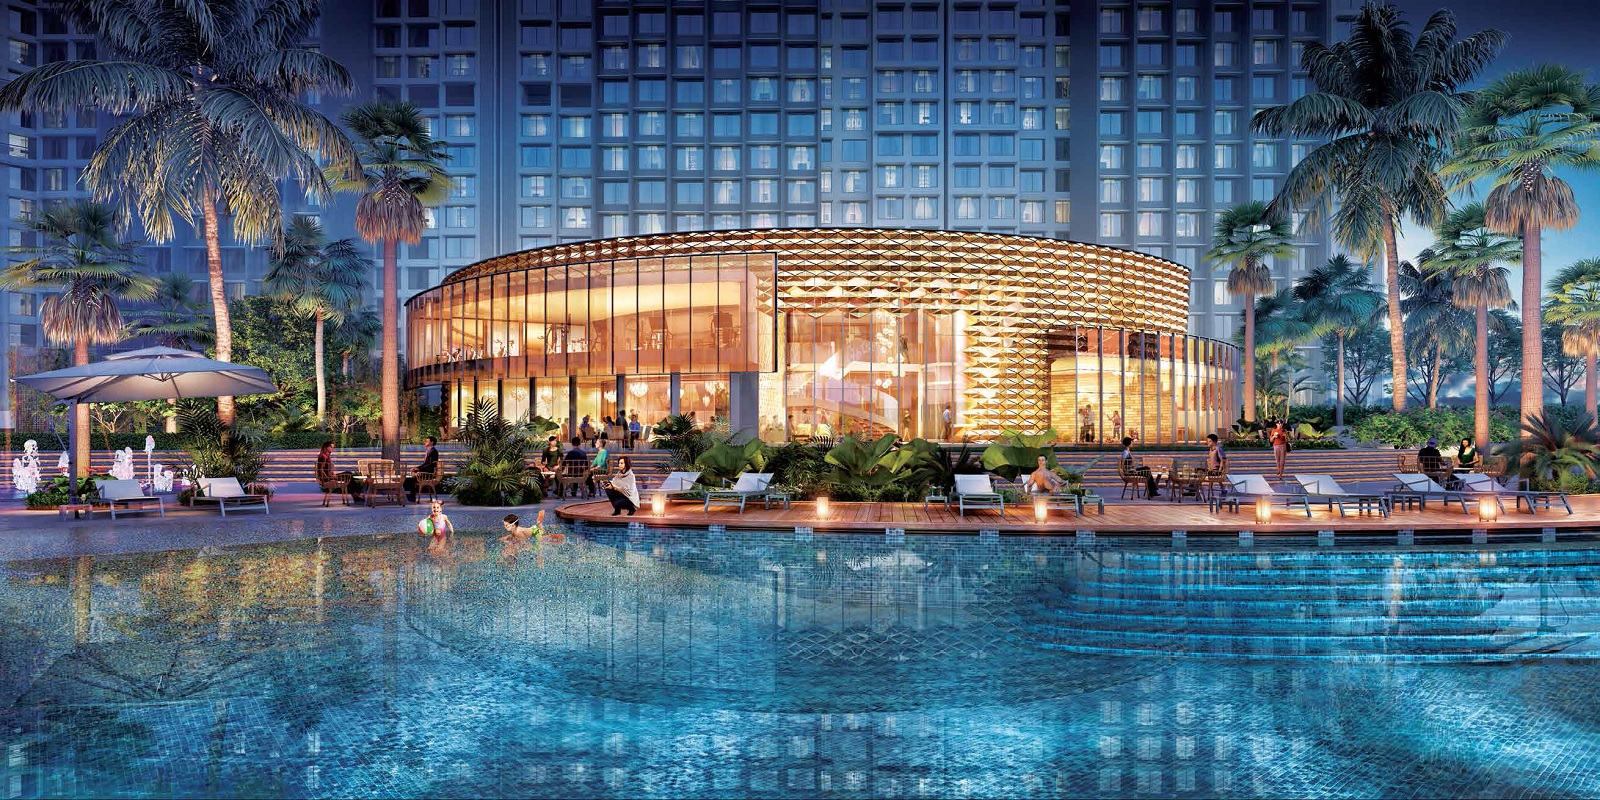 kanakia codename future b amenities features8